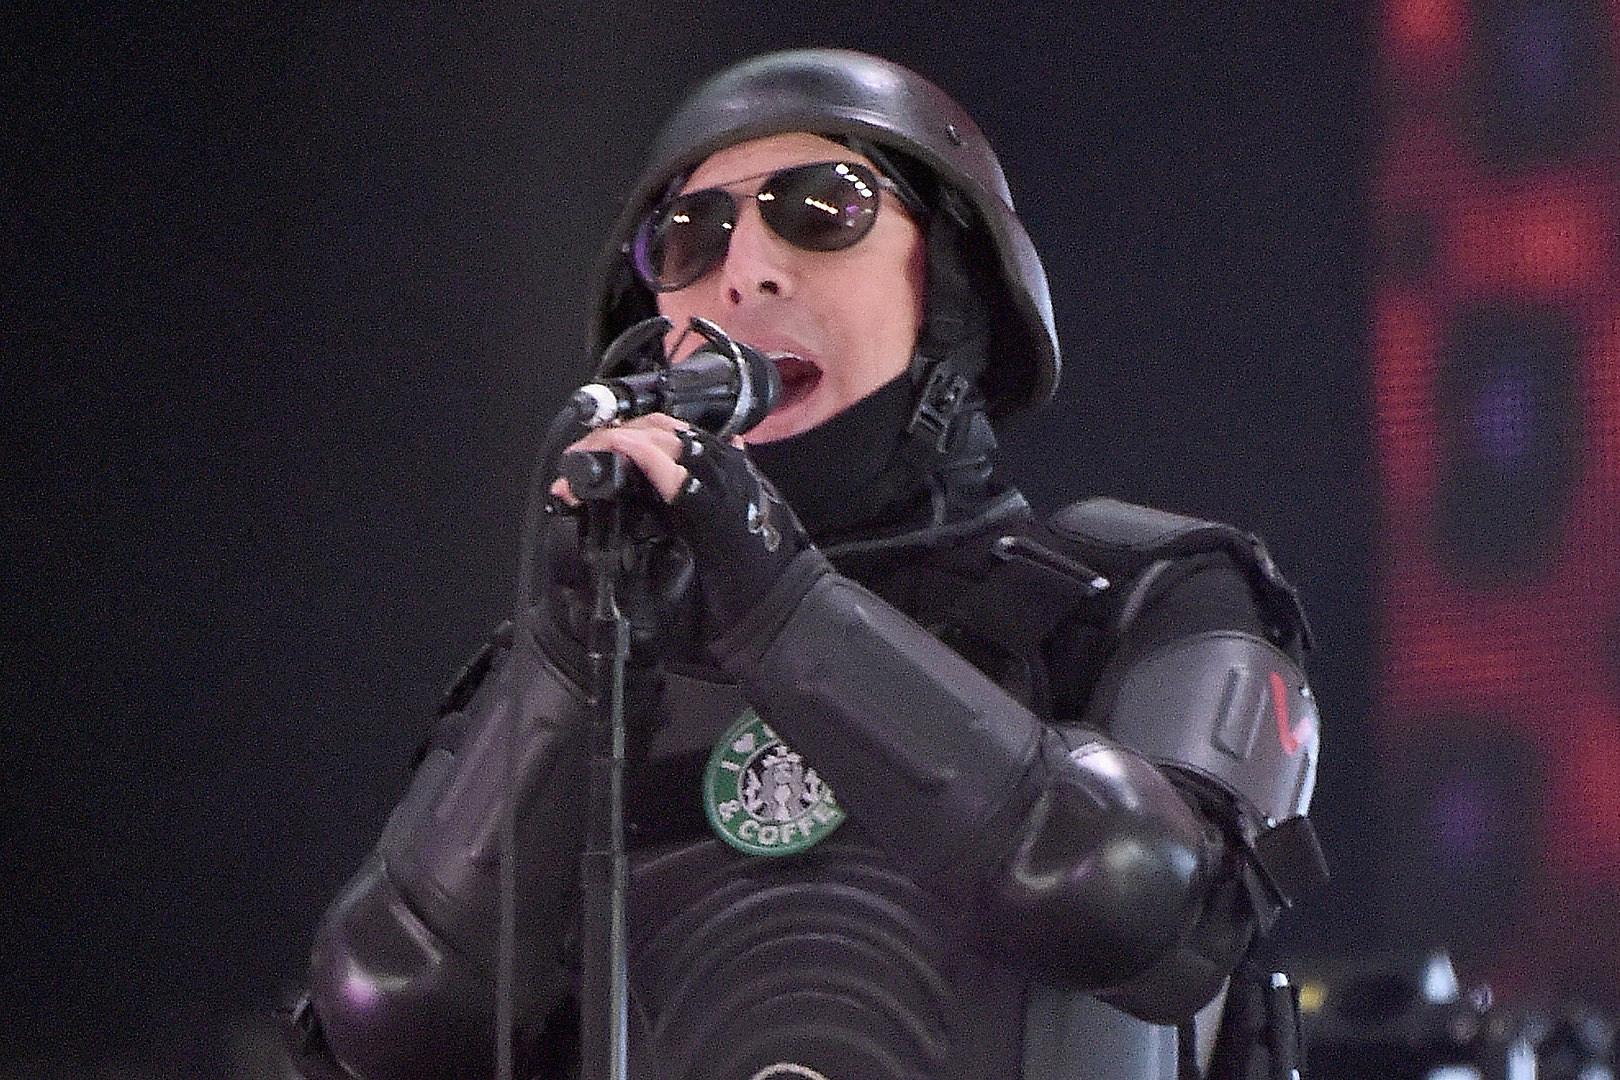 WATCH: Tool Perform New Songs 'Descending' + 'Invincible'